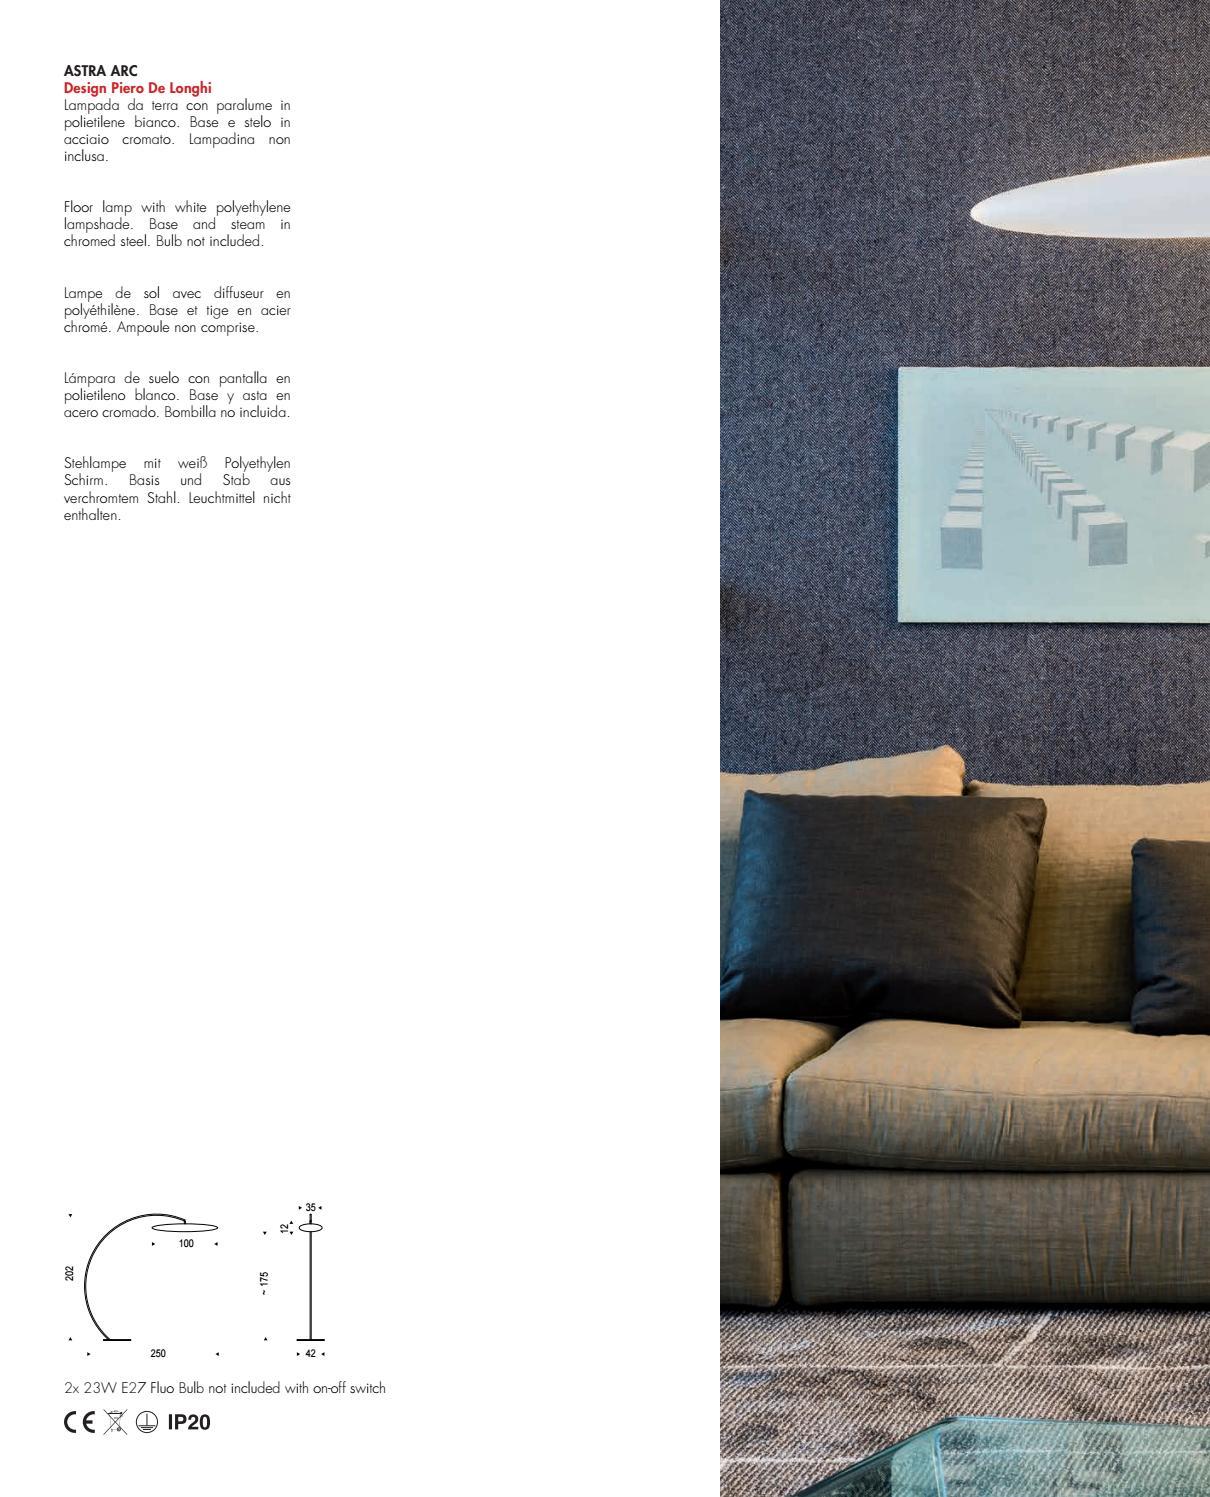 Lampada Da Studio Design cattelan italia lighting by planetasveta - issuu